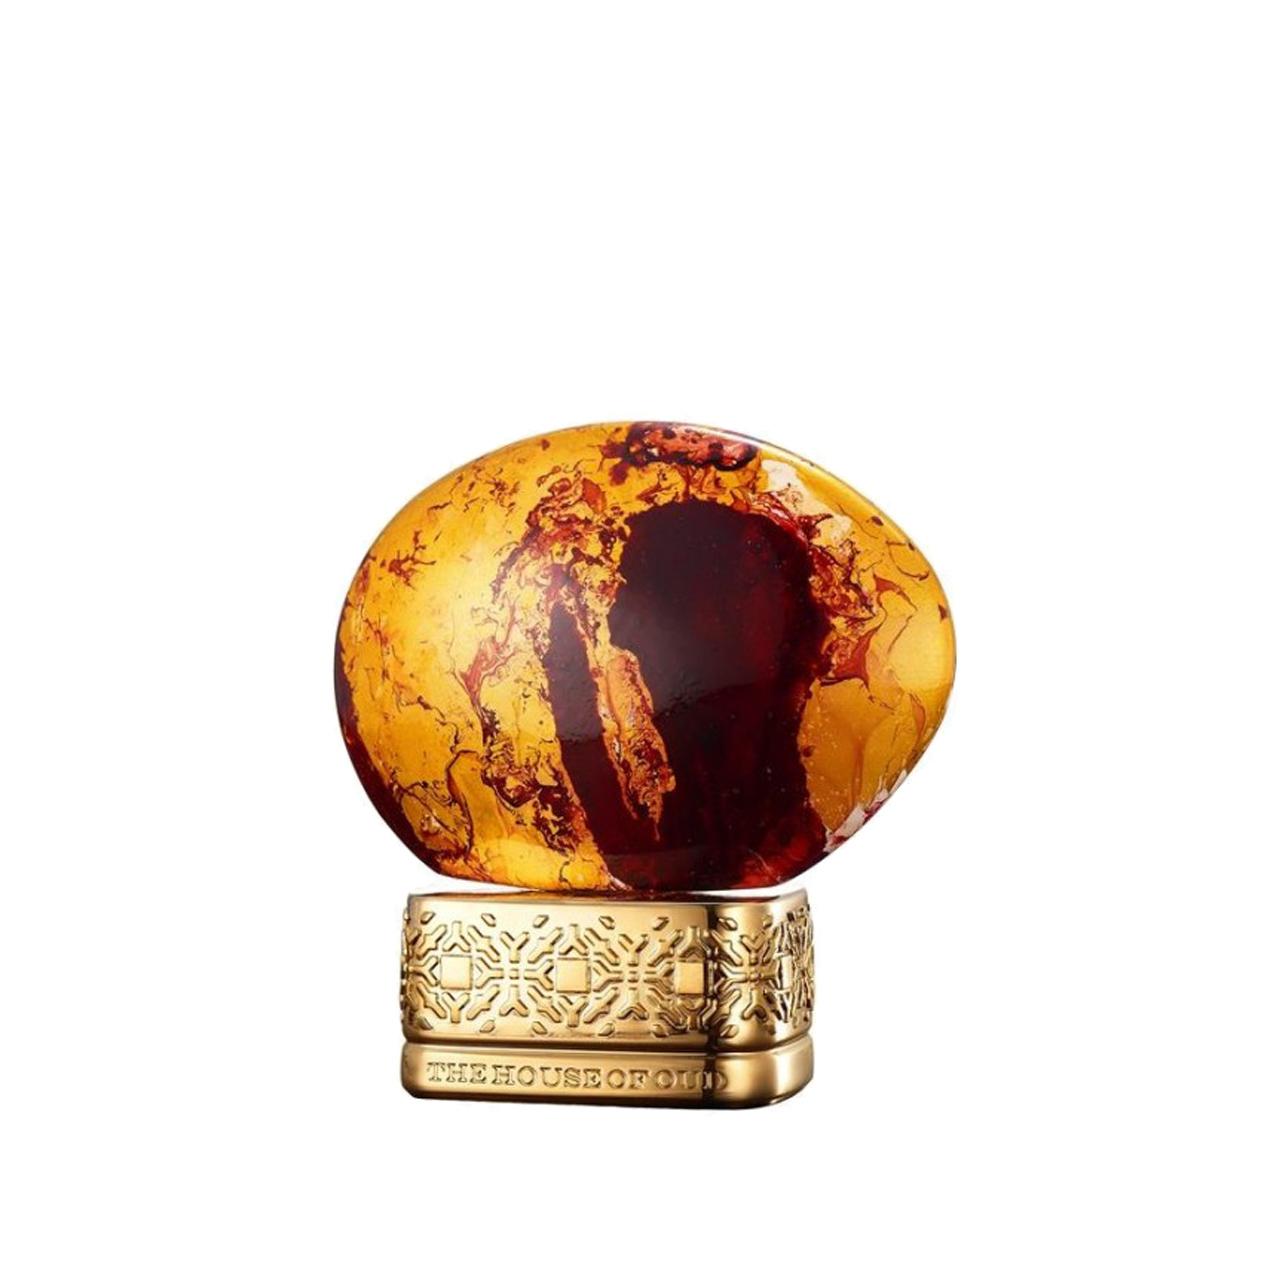 Almond Harmony - Eau de Parfum